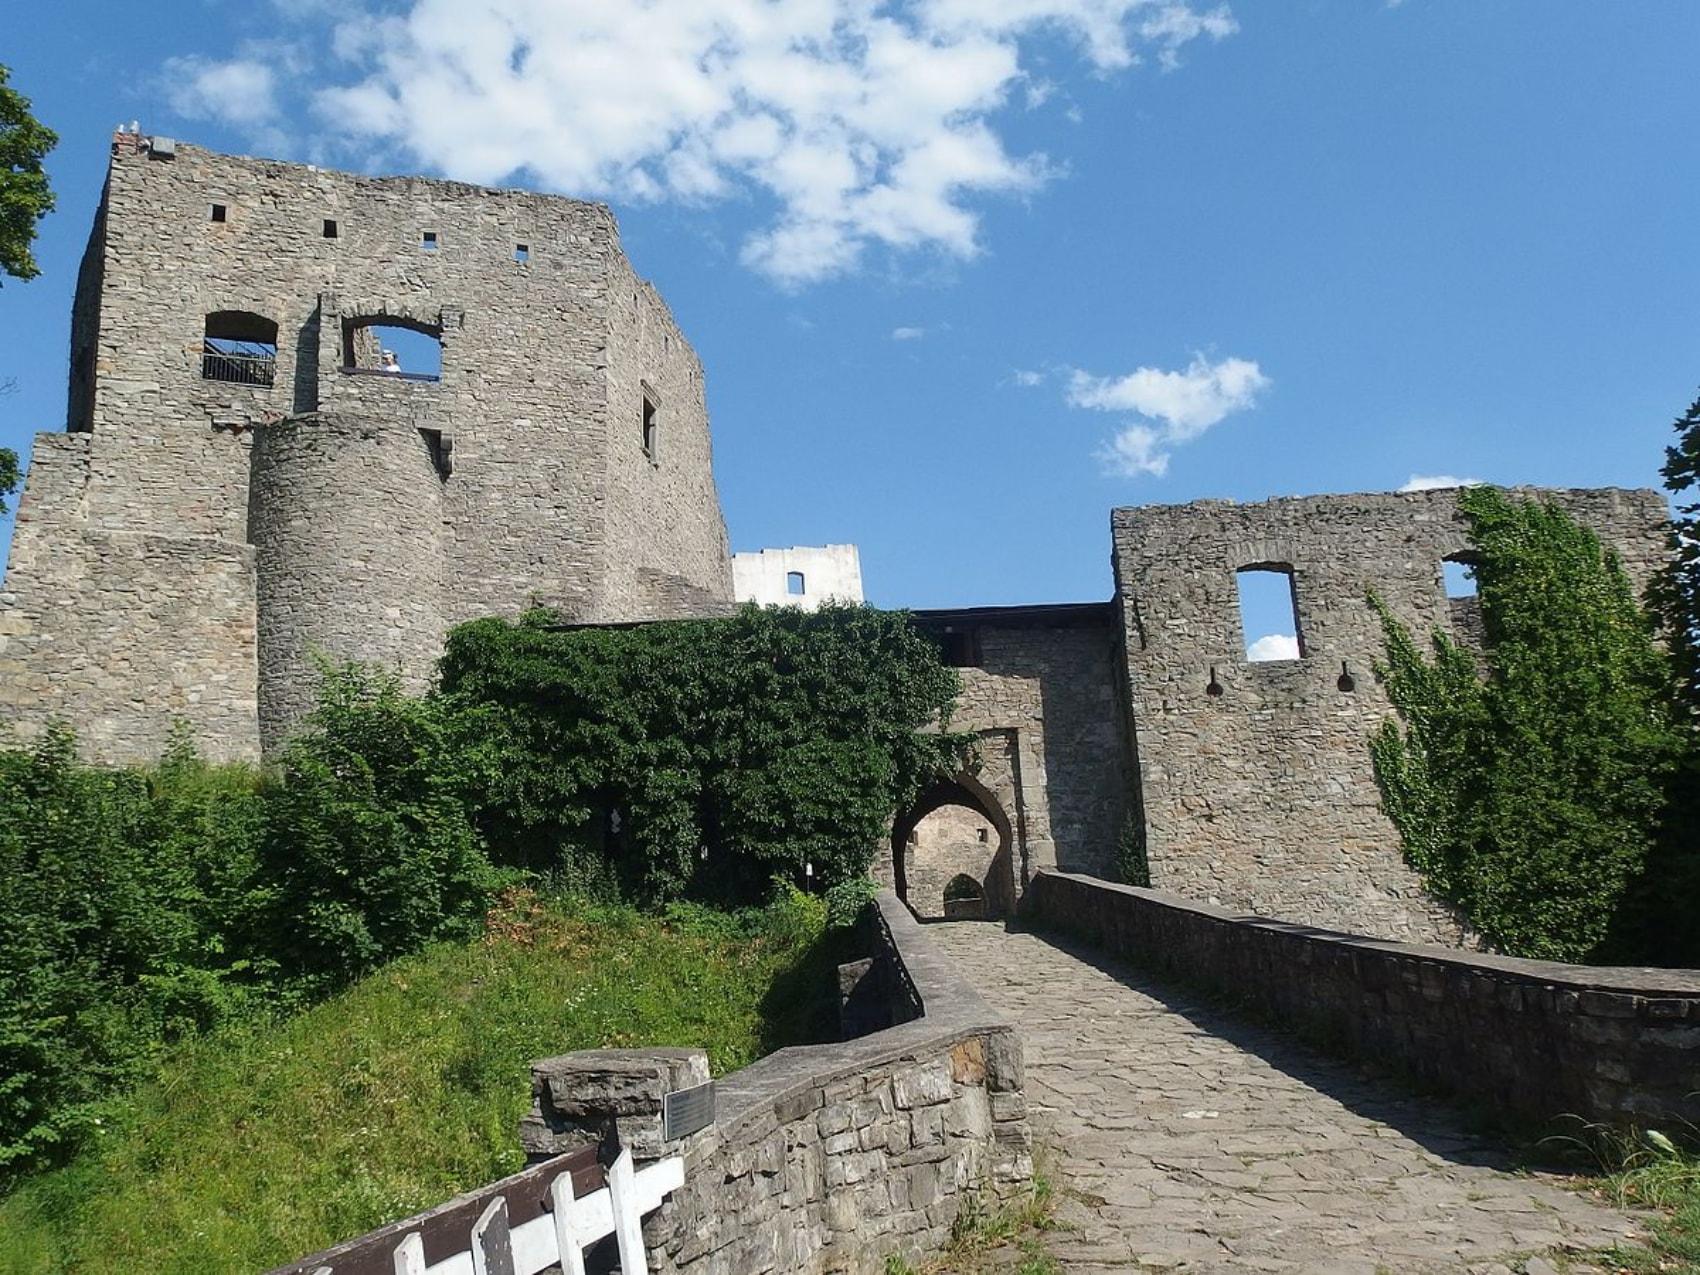 Ruins of Hukvaldy Castle